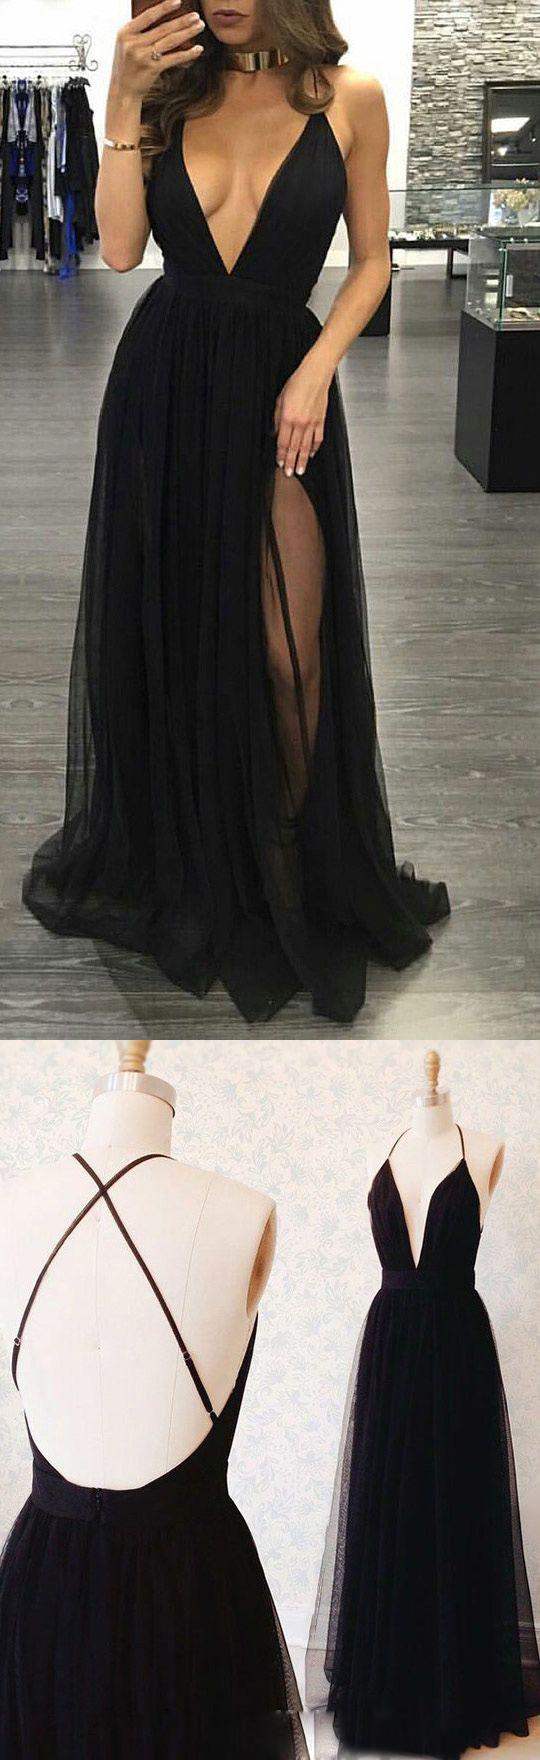 Black prom dress sexy backless deep vneck spaghetti straps long